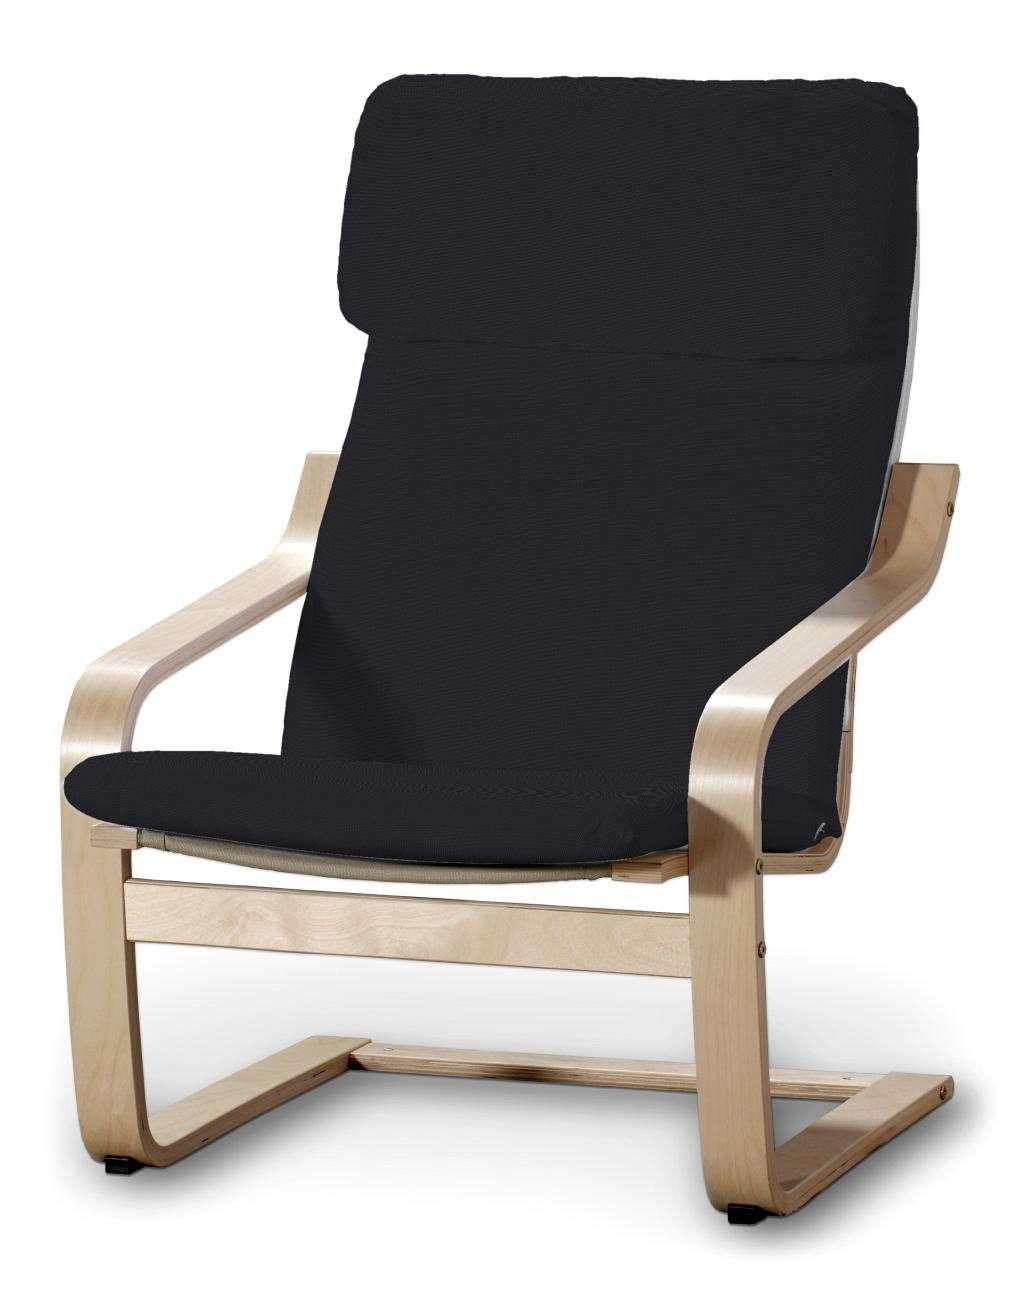 Poduszka na fotel Poäng w kolekcji Etna, tkanina: 705-00